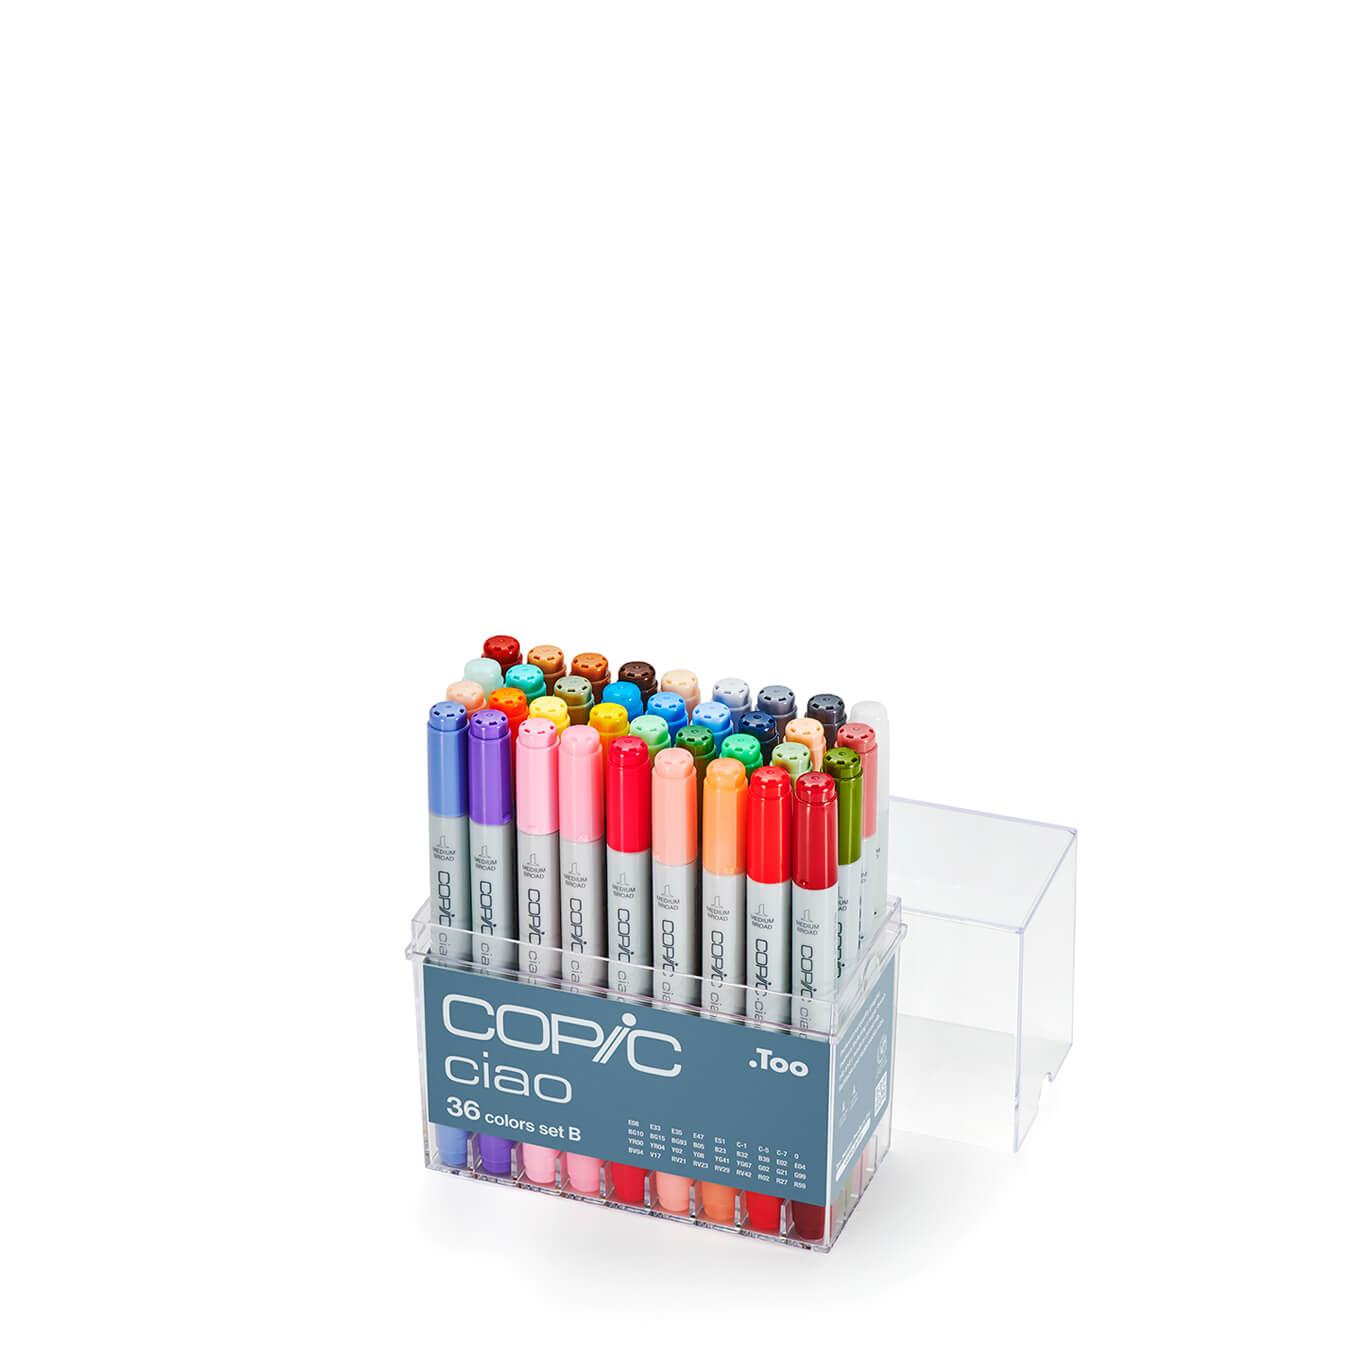 Copic Ciao 36 colors set B